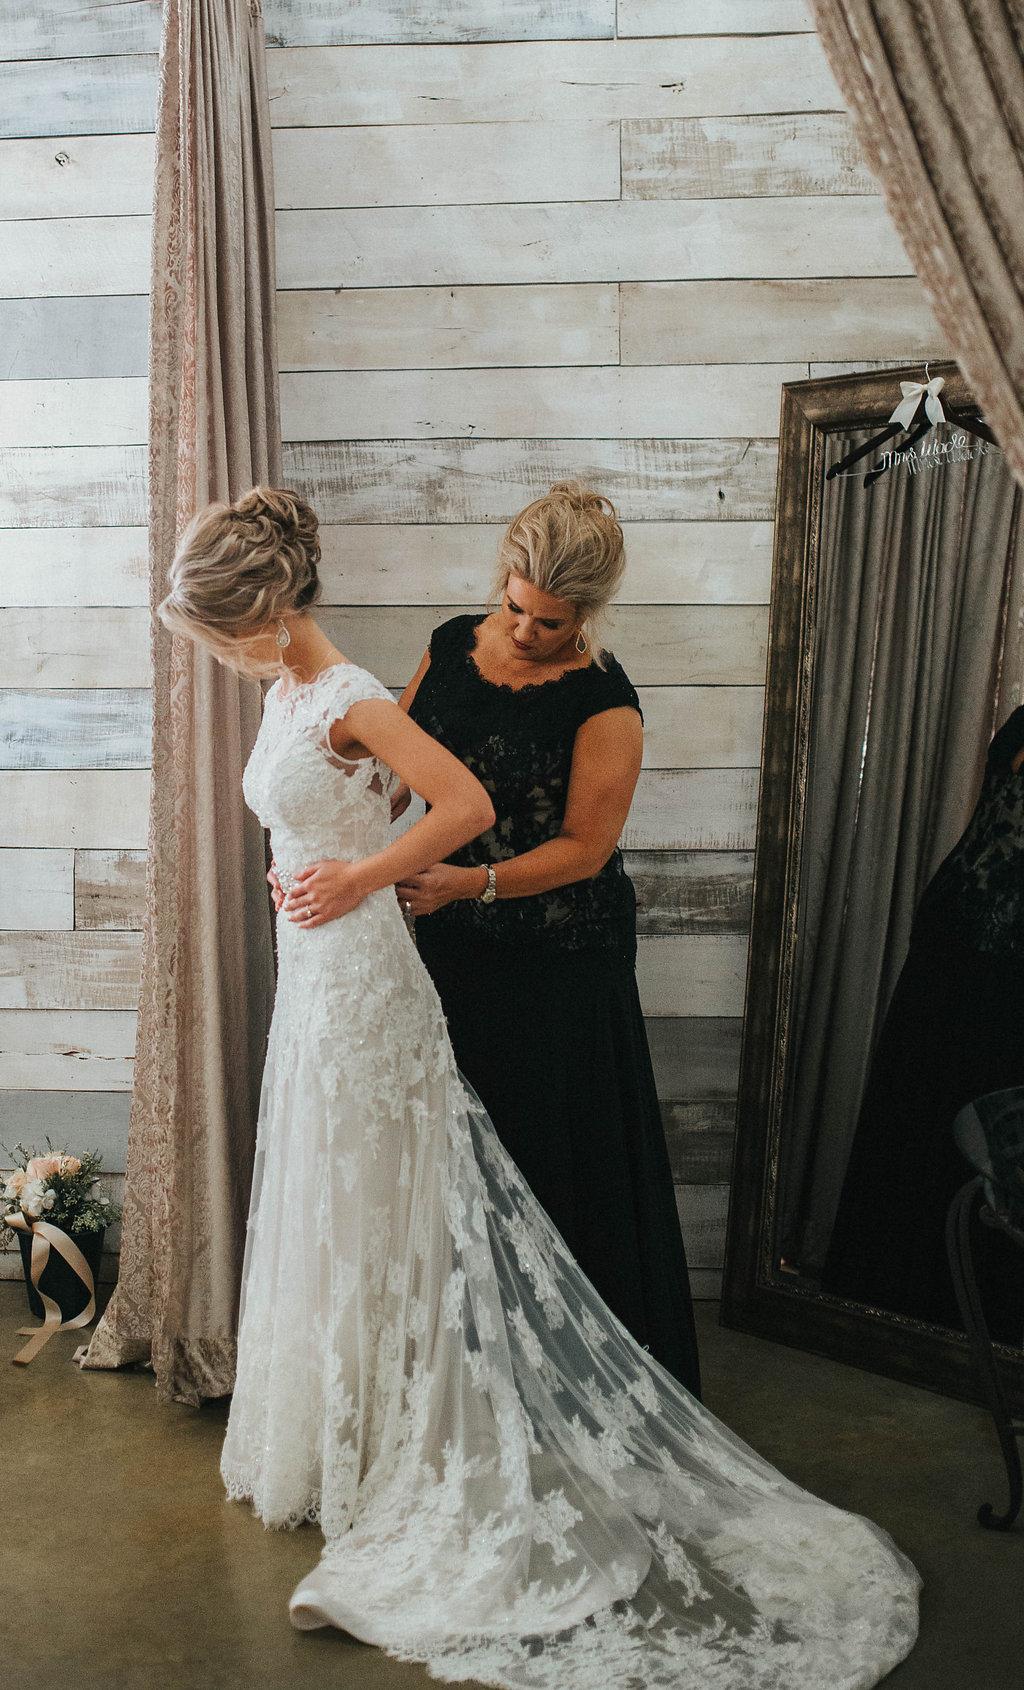 Real Weddings By Whittington Bridal Haley Sears Bridal Shop Houston Tx Whittington Bridal